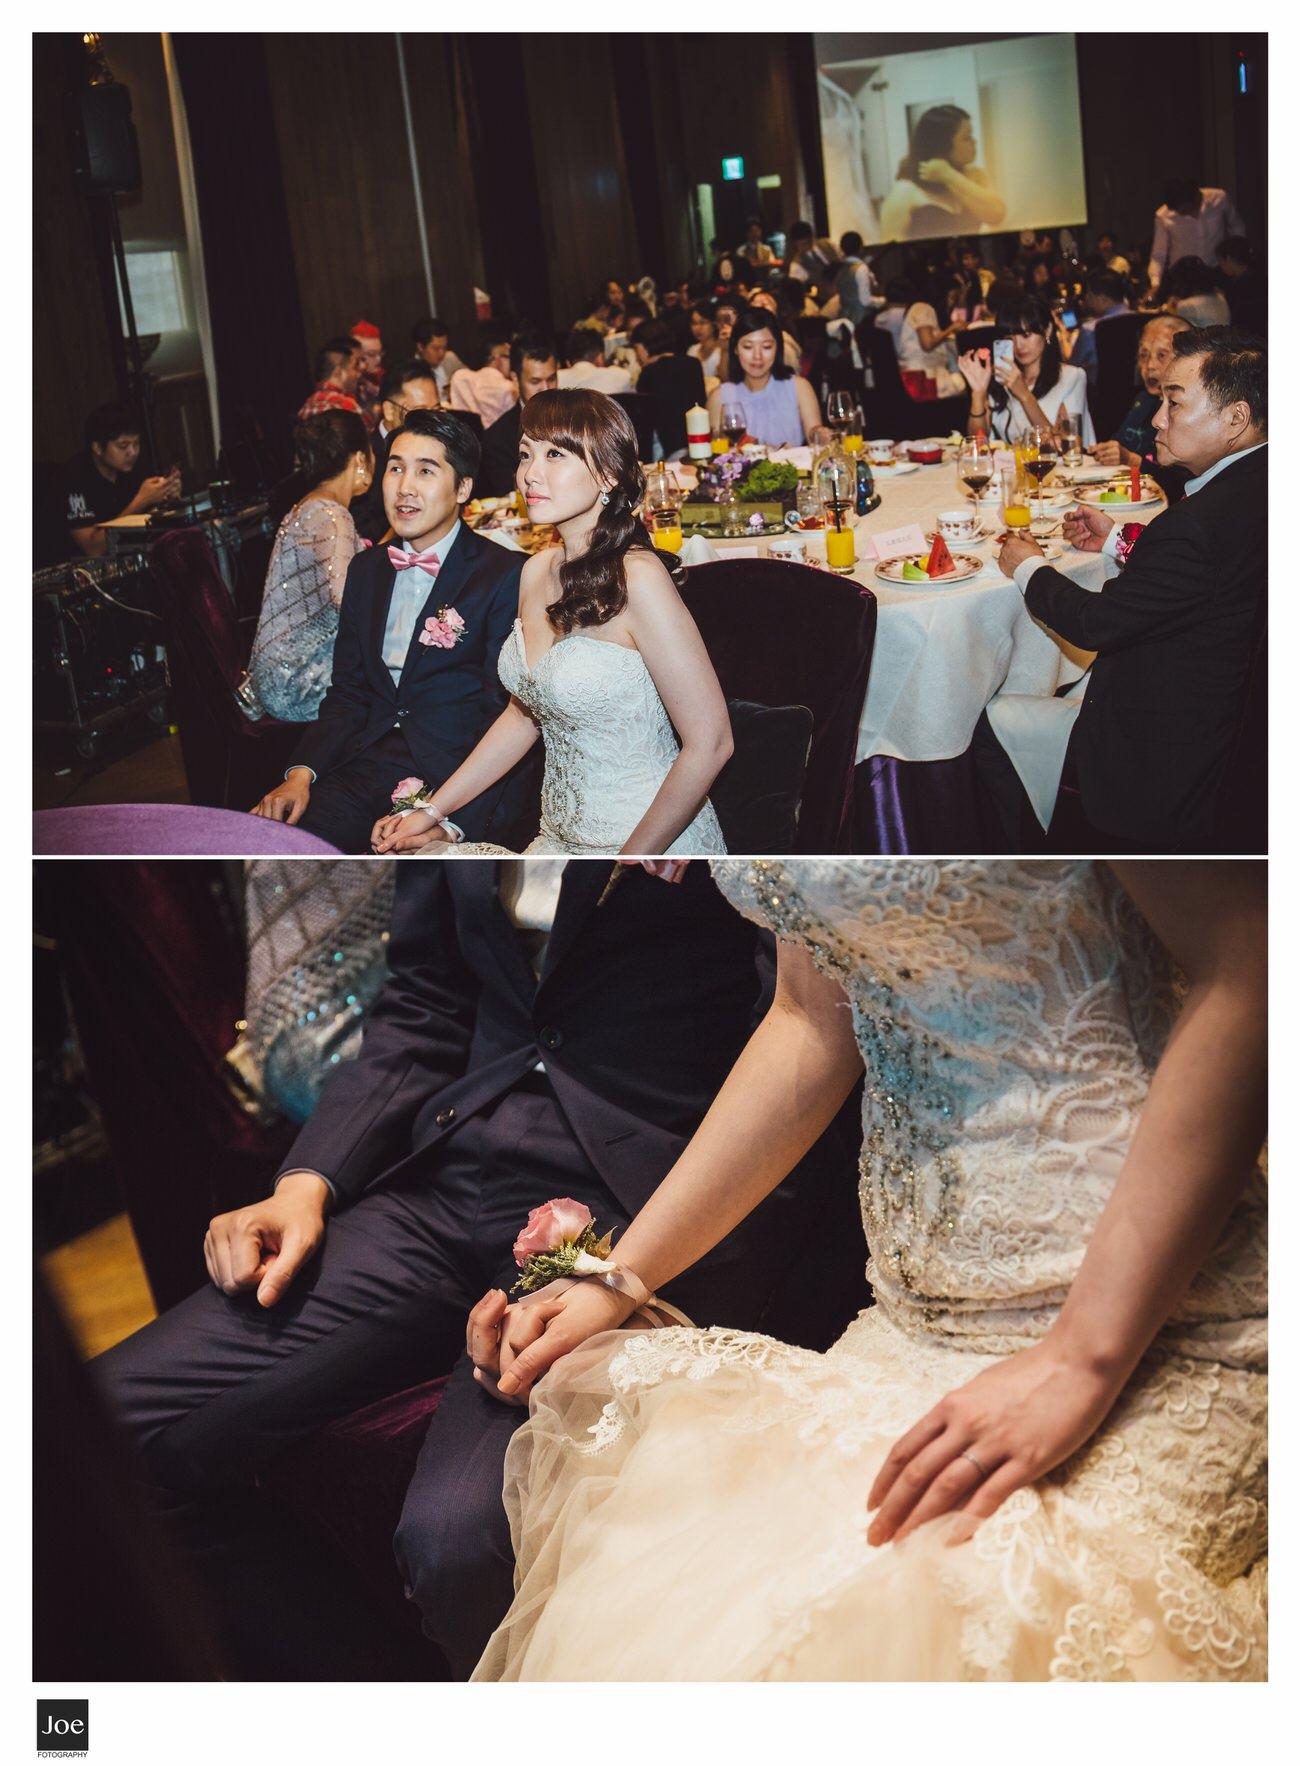 joe-fotography-wedding-photo-palais-de-chine-hotel-050.jpg